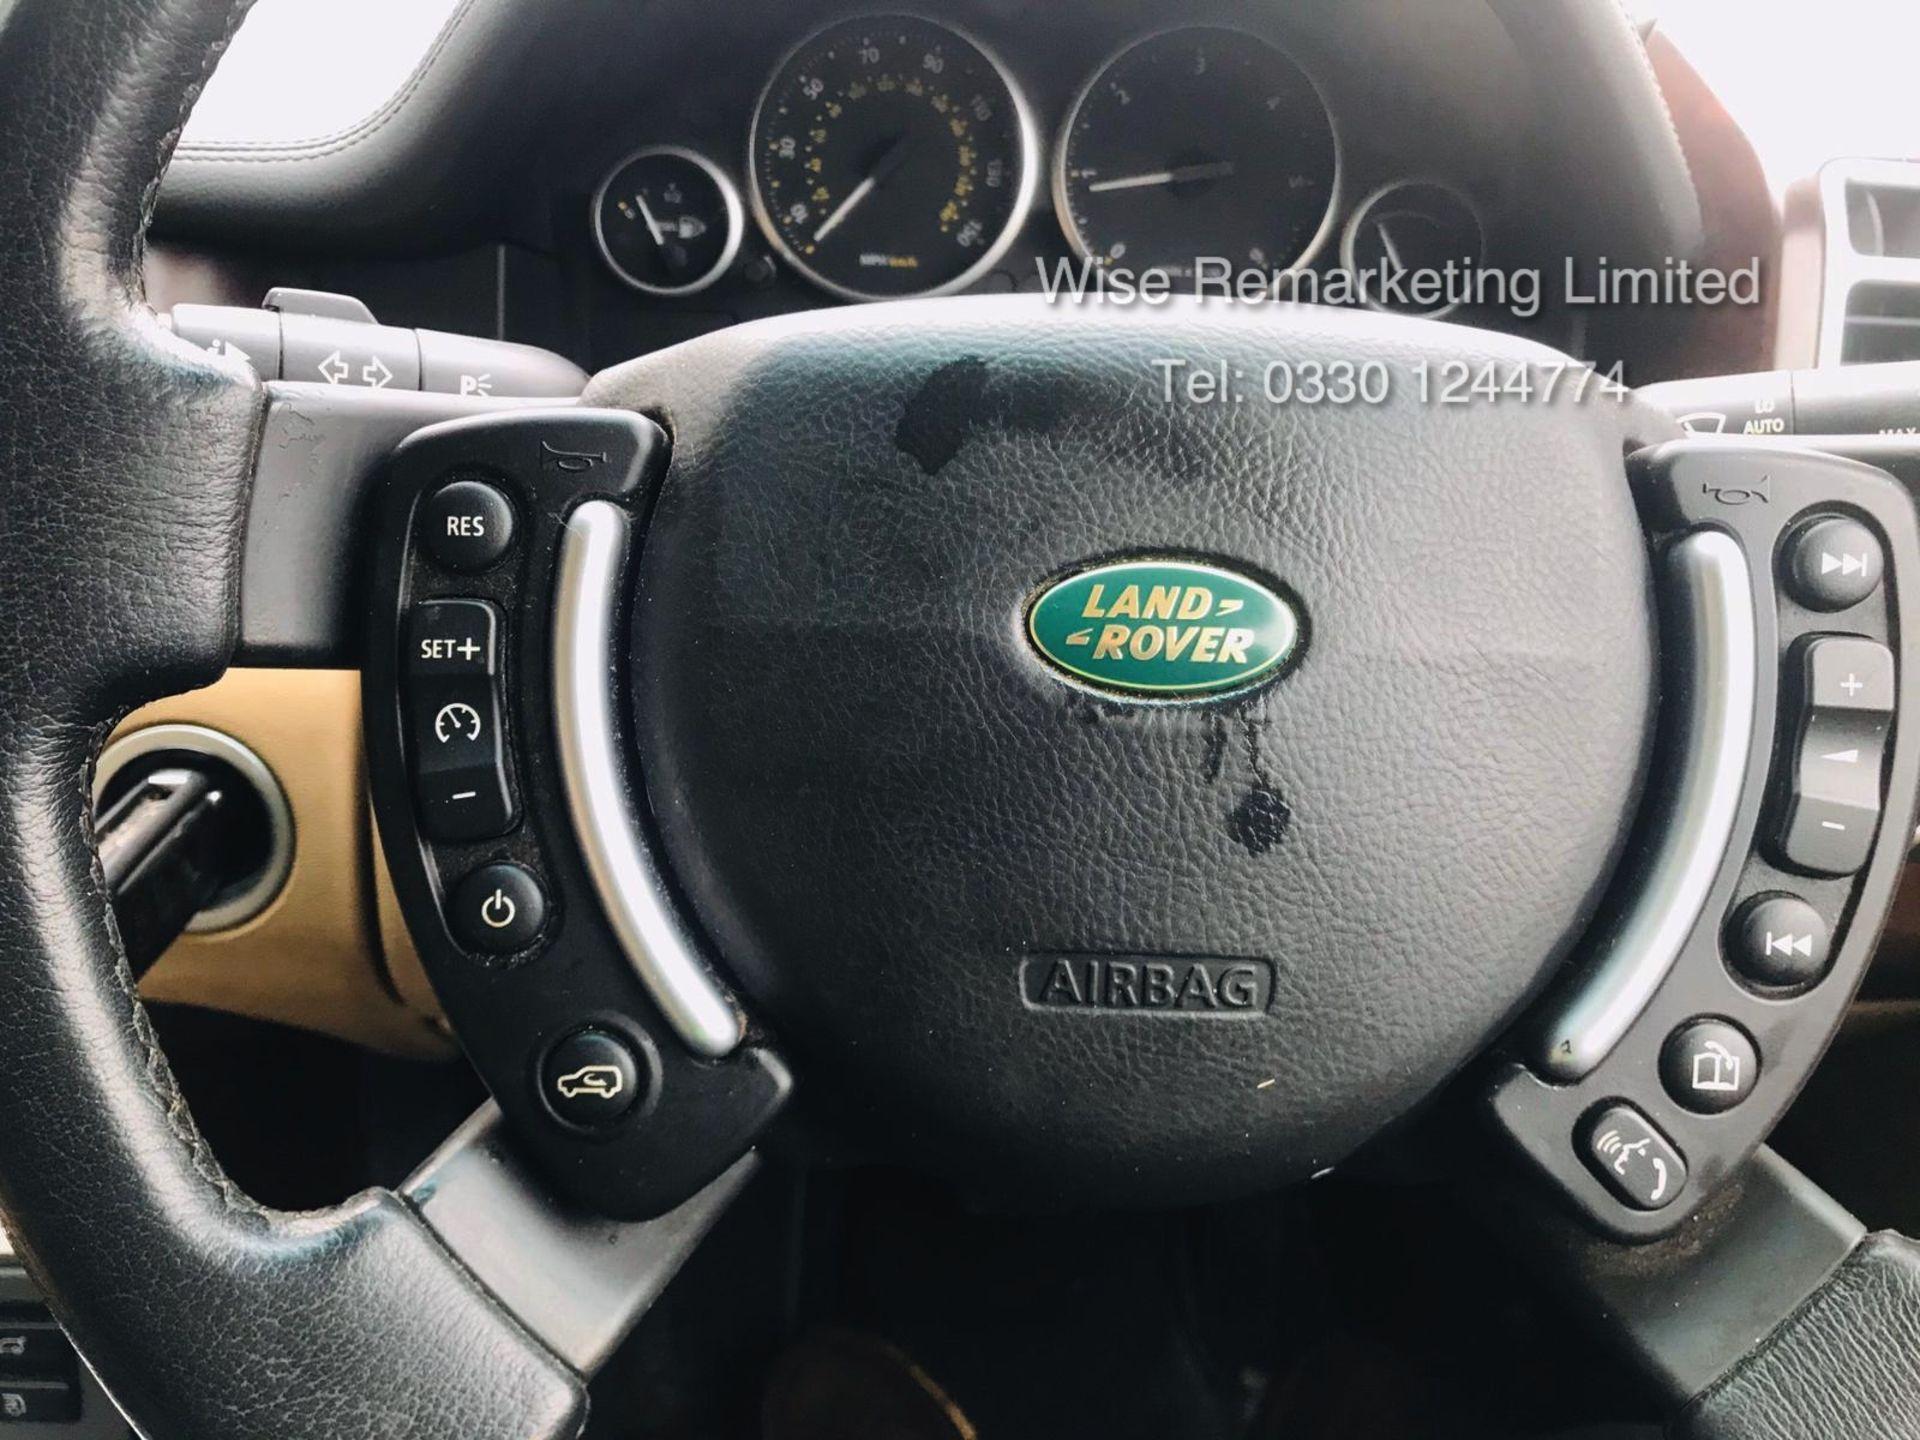 Range Rover Vogue 3.6 TDV8 HSE Auto - 2010 Model - Cream Leather - Service History - - Image 28 of 28